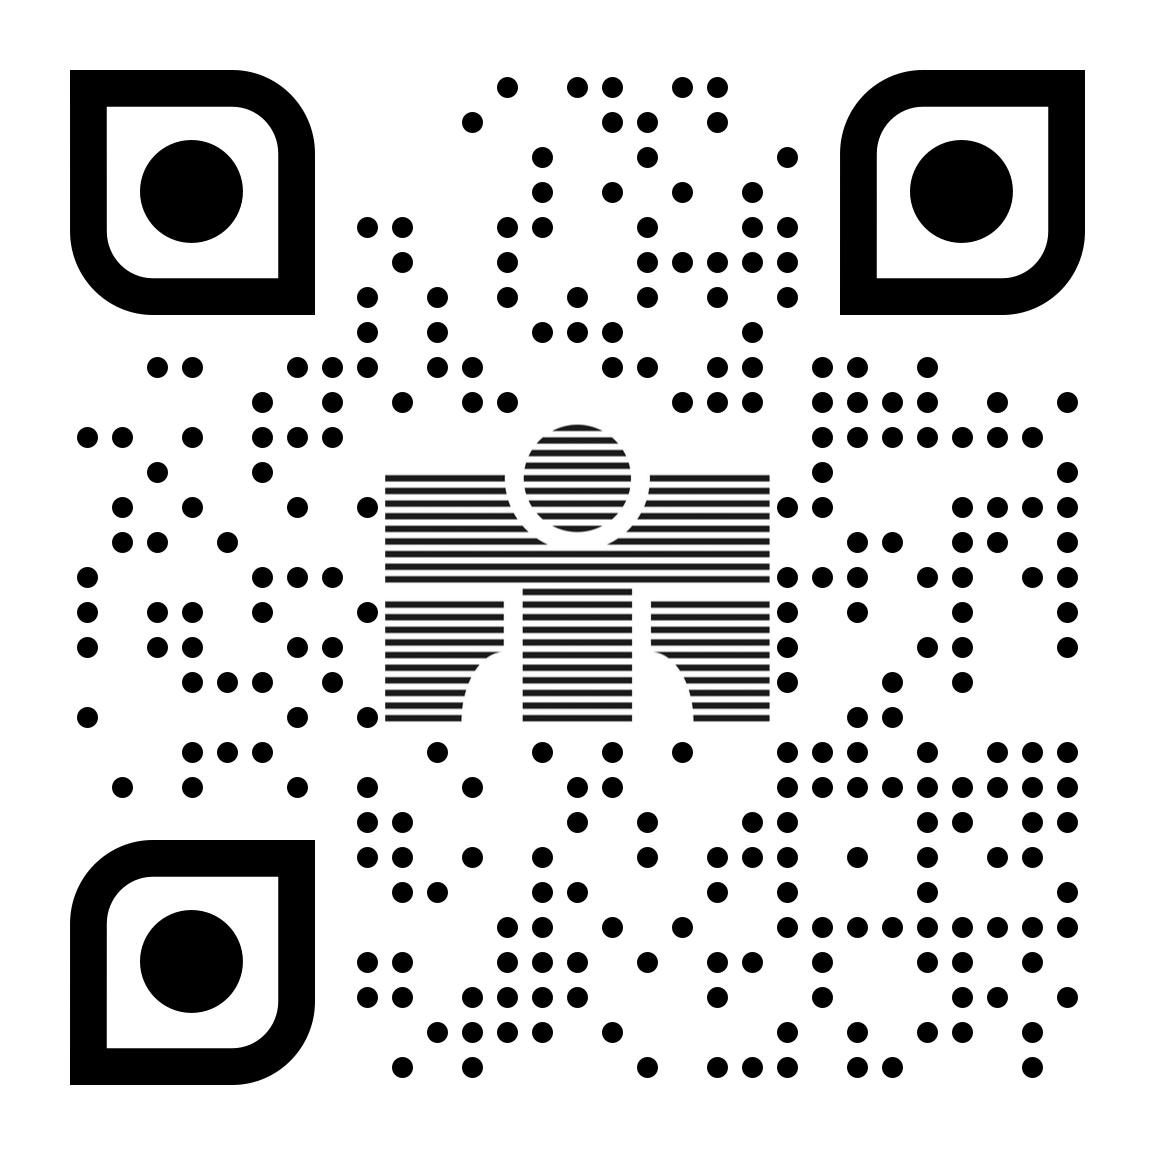 qr-code_no-name.png